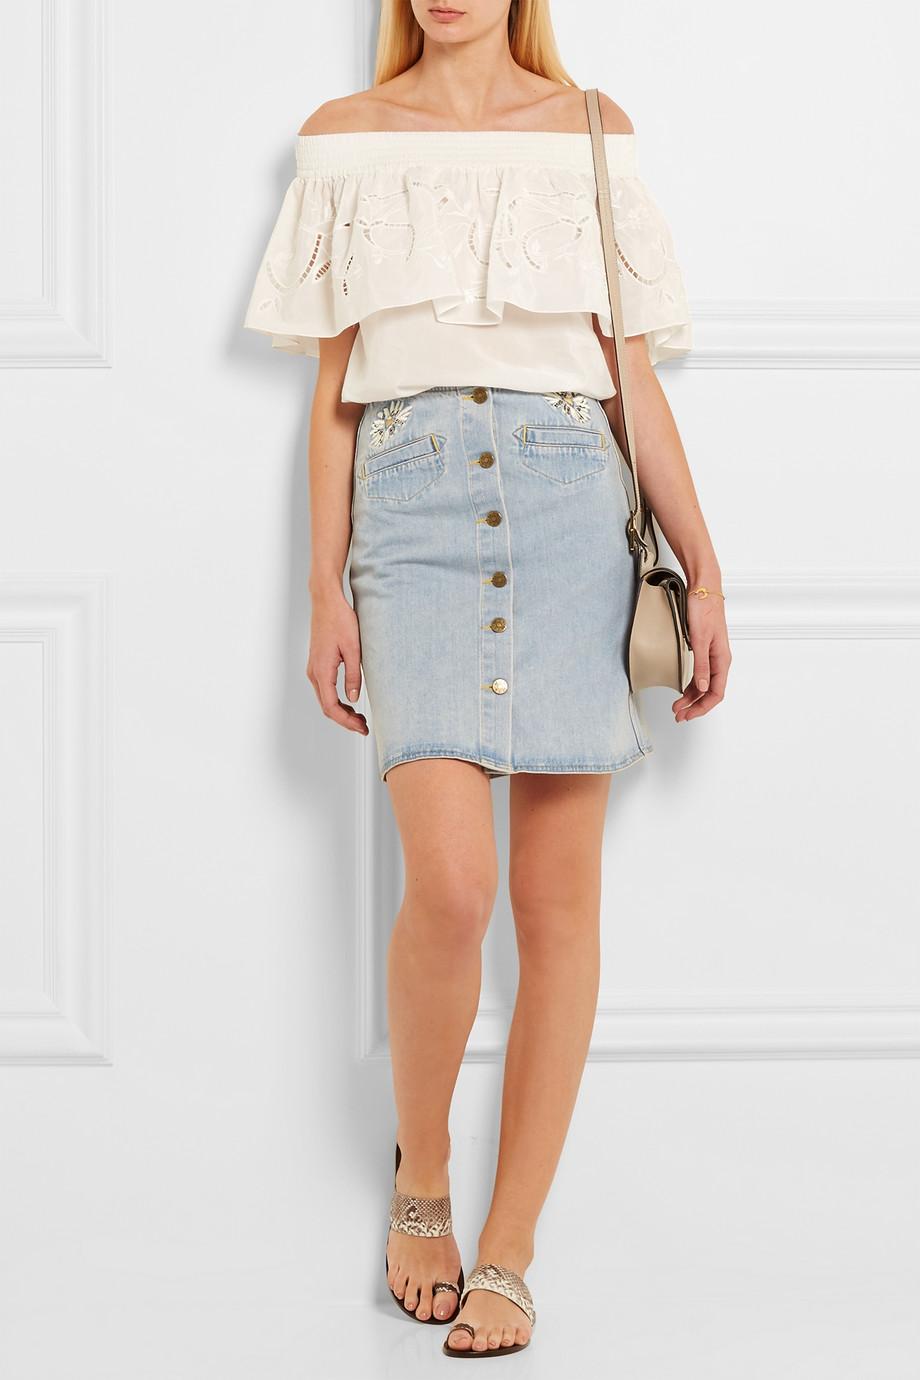 denim skirt style 1